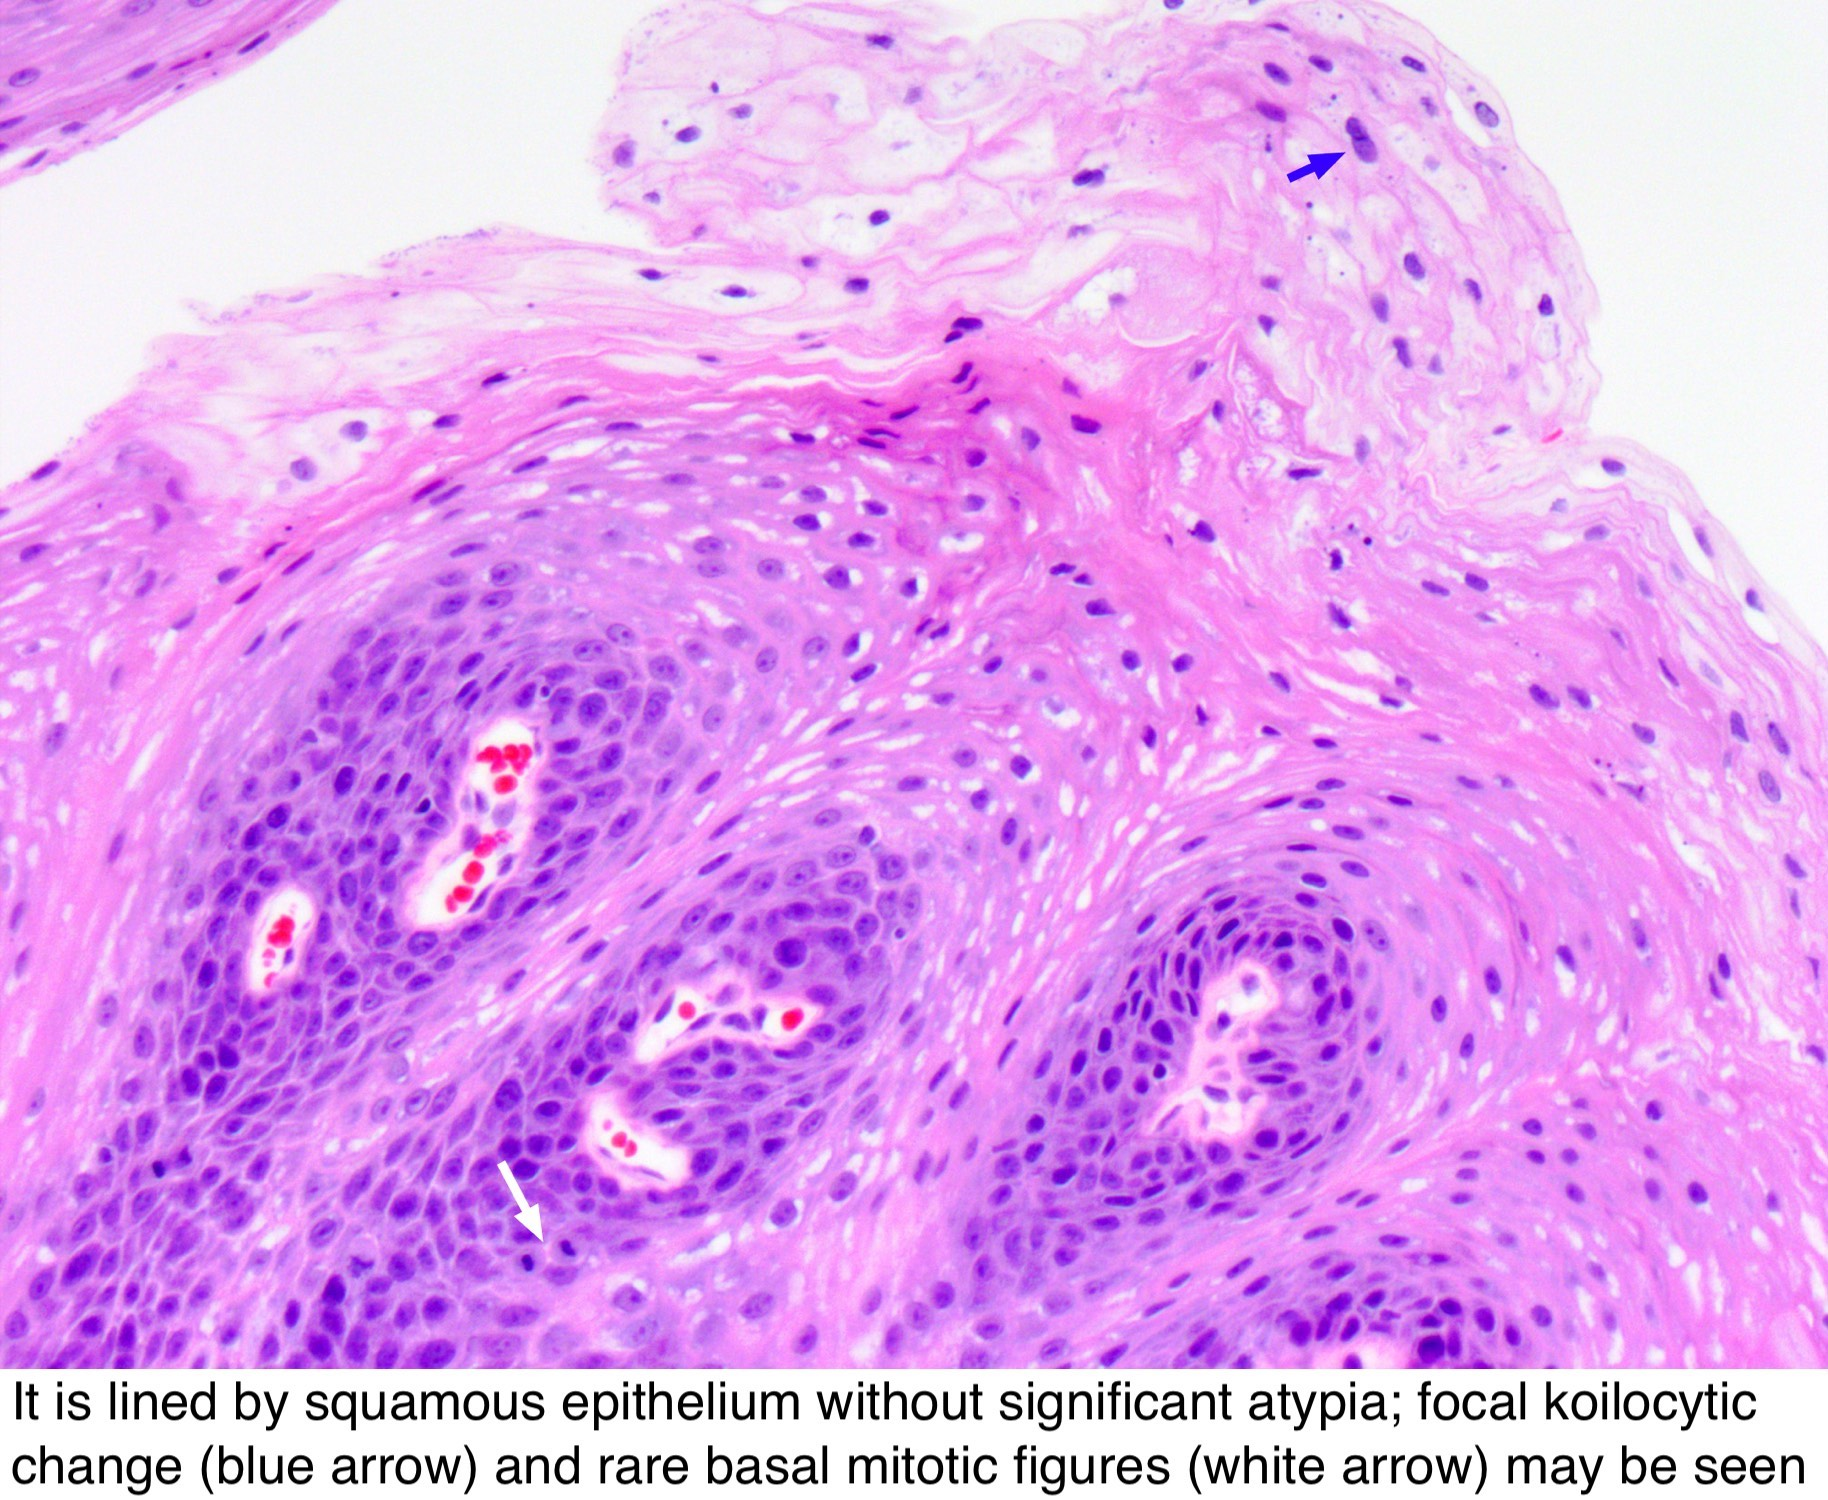 squamous papilloma with mild dysplasia condyloma acuminatum and pregnancy